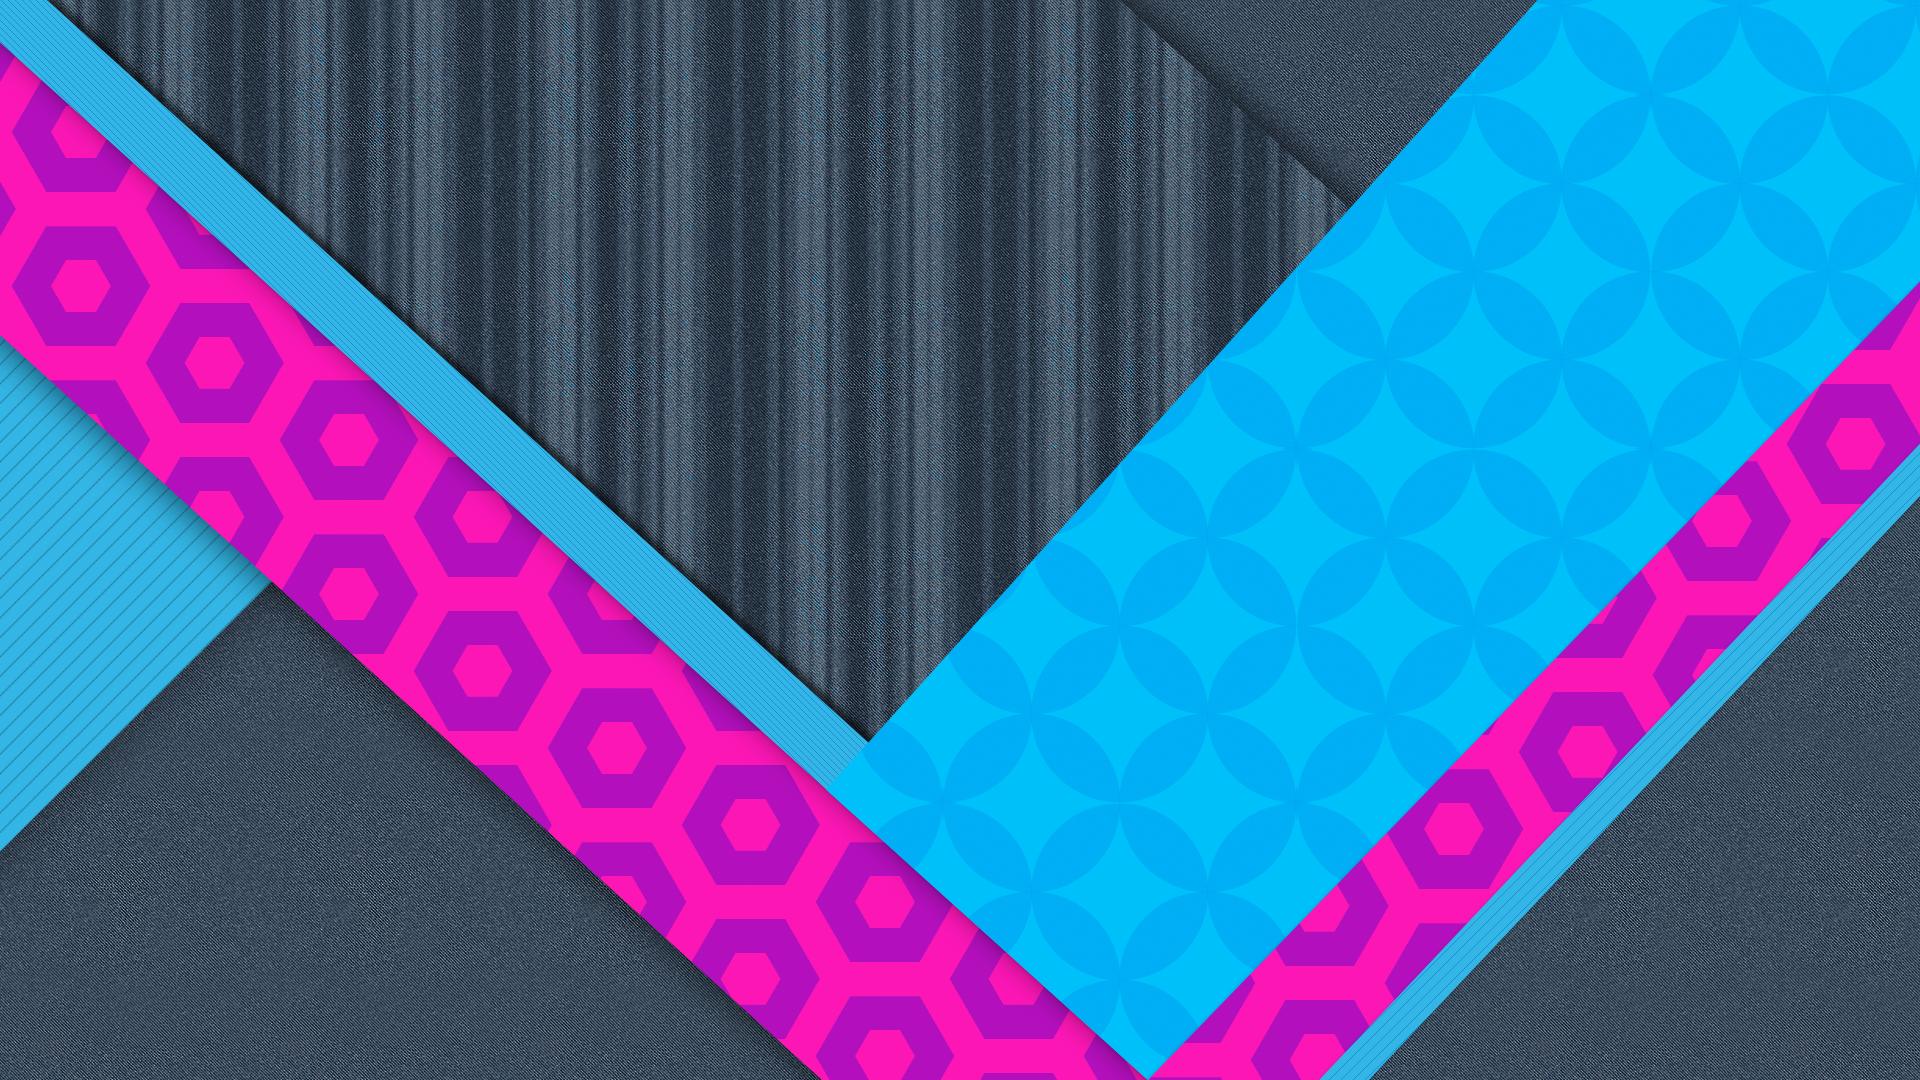 80 google material design hd wallpapers vigorous art for Wallpaper hd home design